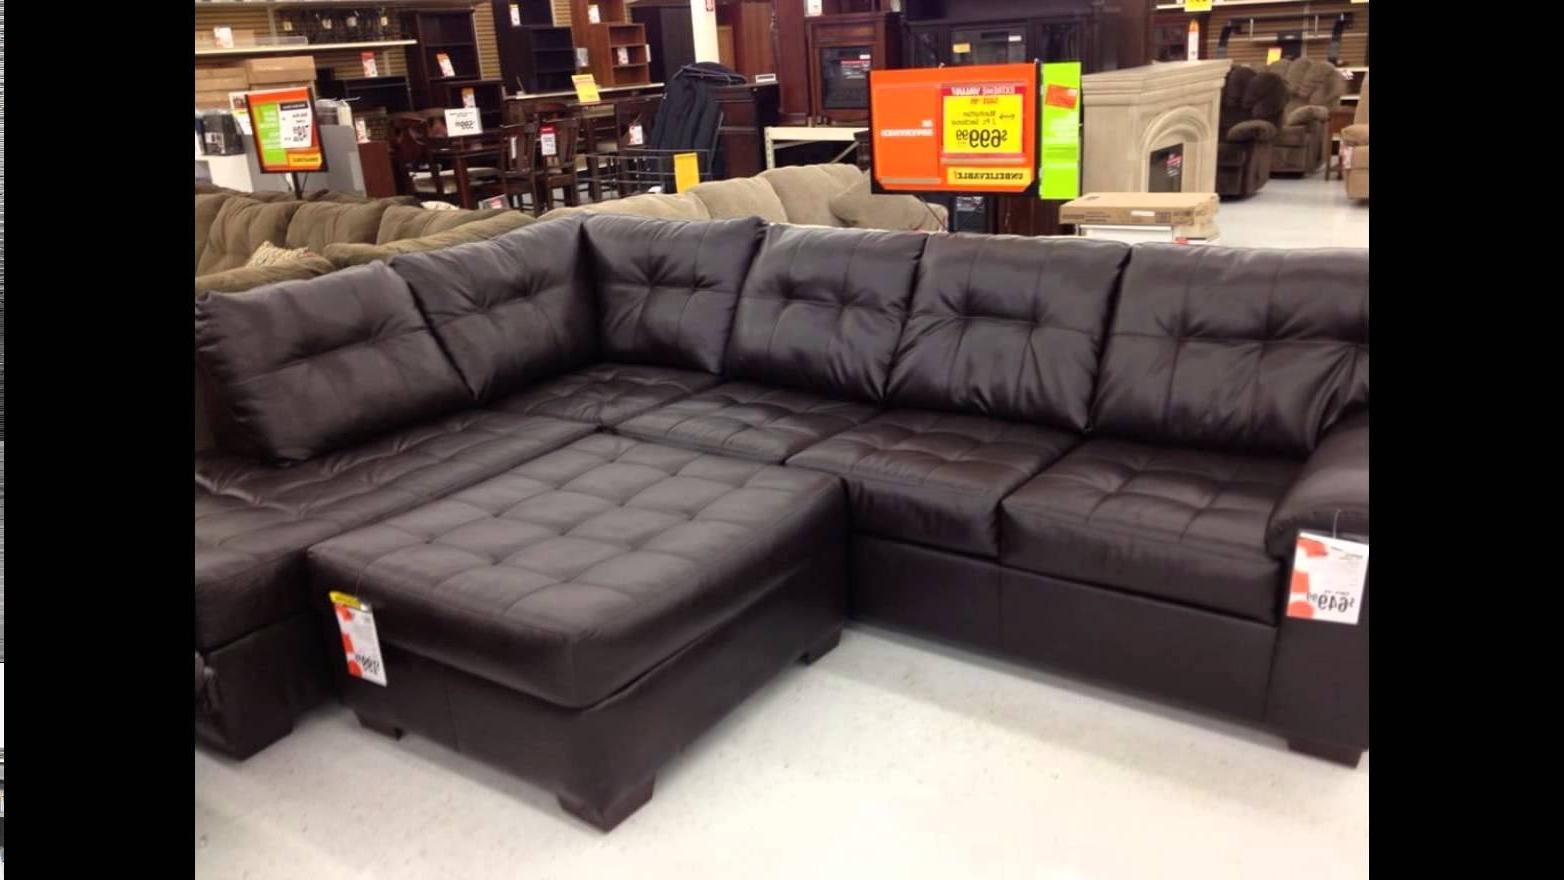 Most Popular Big Lots Furniture  Big Lots Furniture Sale – Youtube Regarding Big Lots Sofas (View 8 of 15)